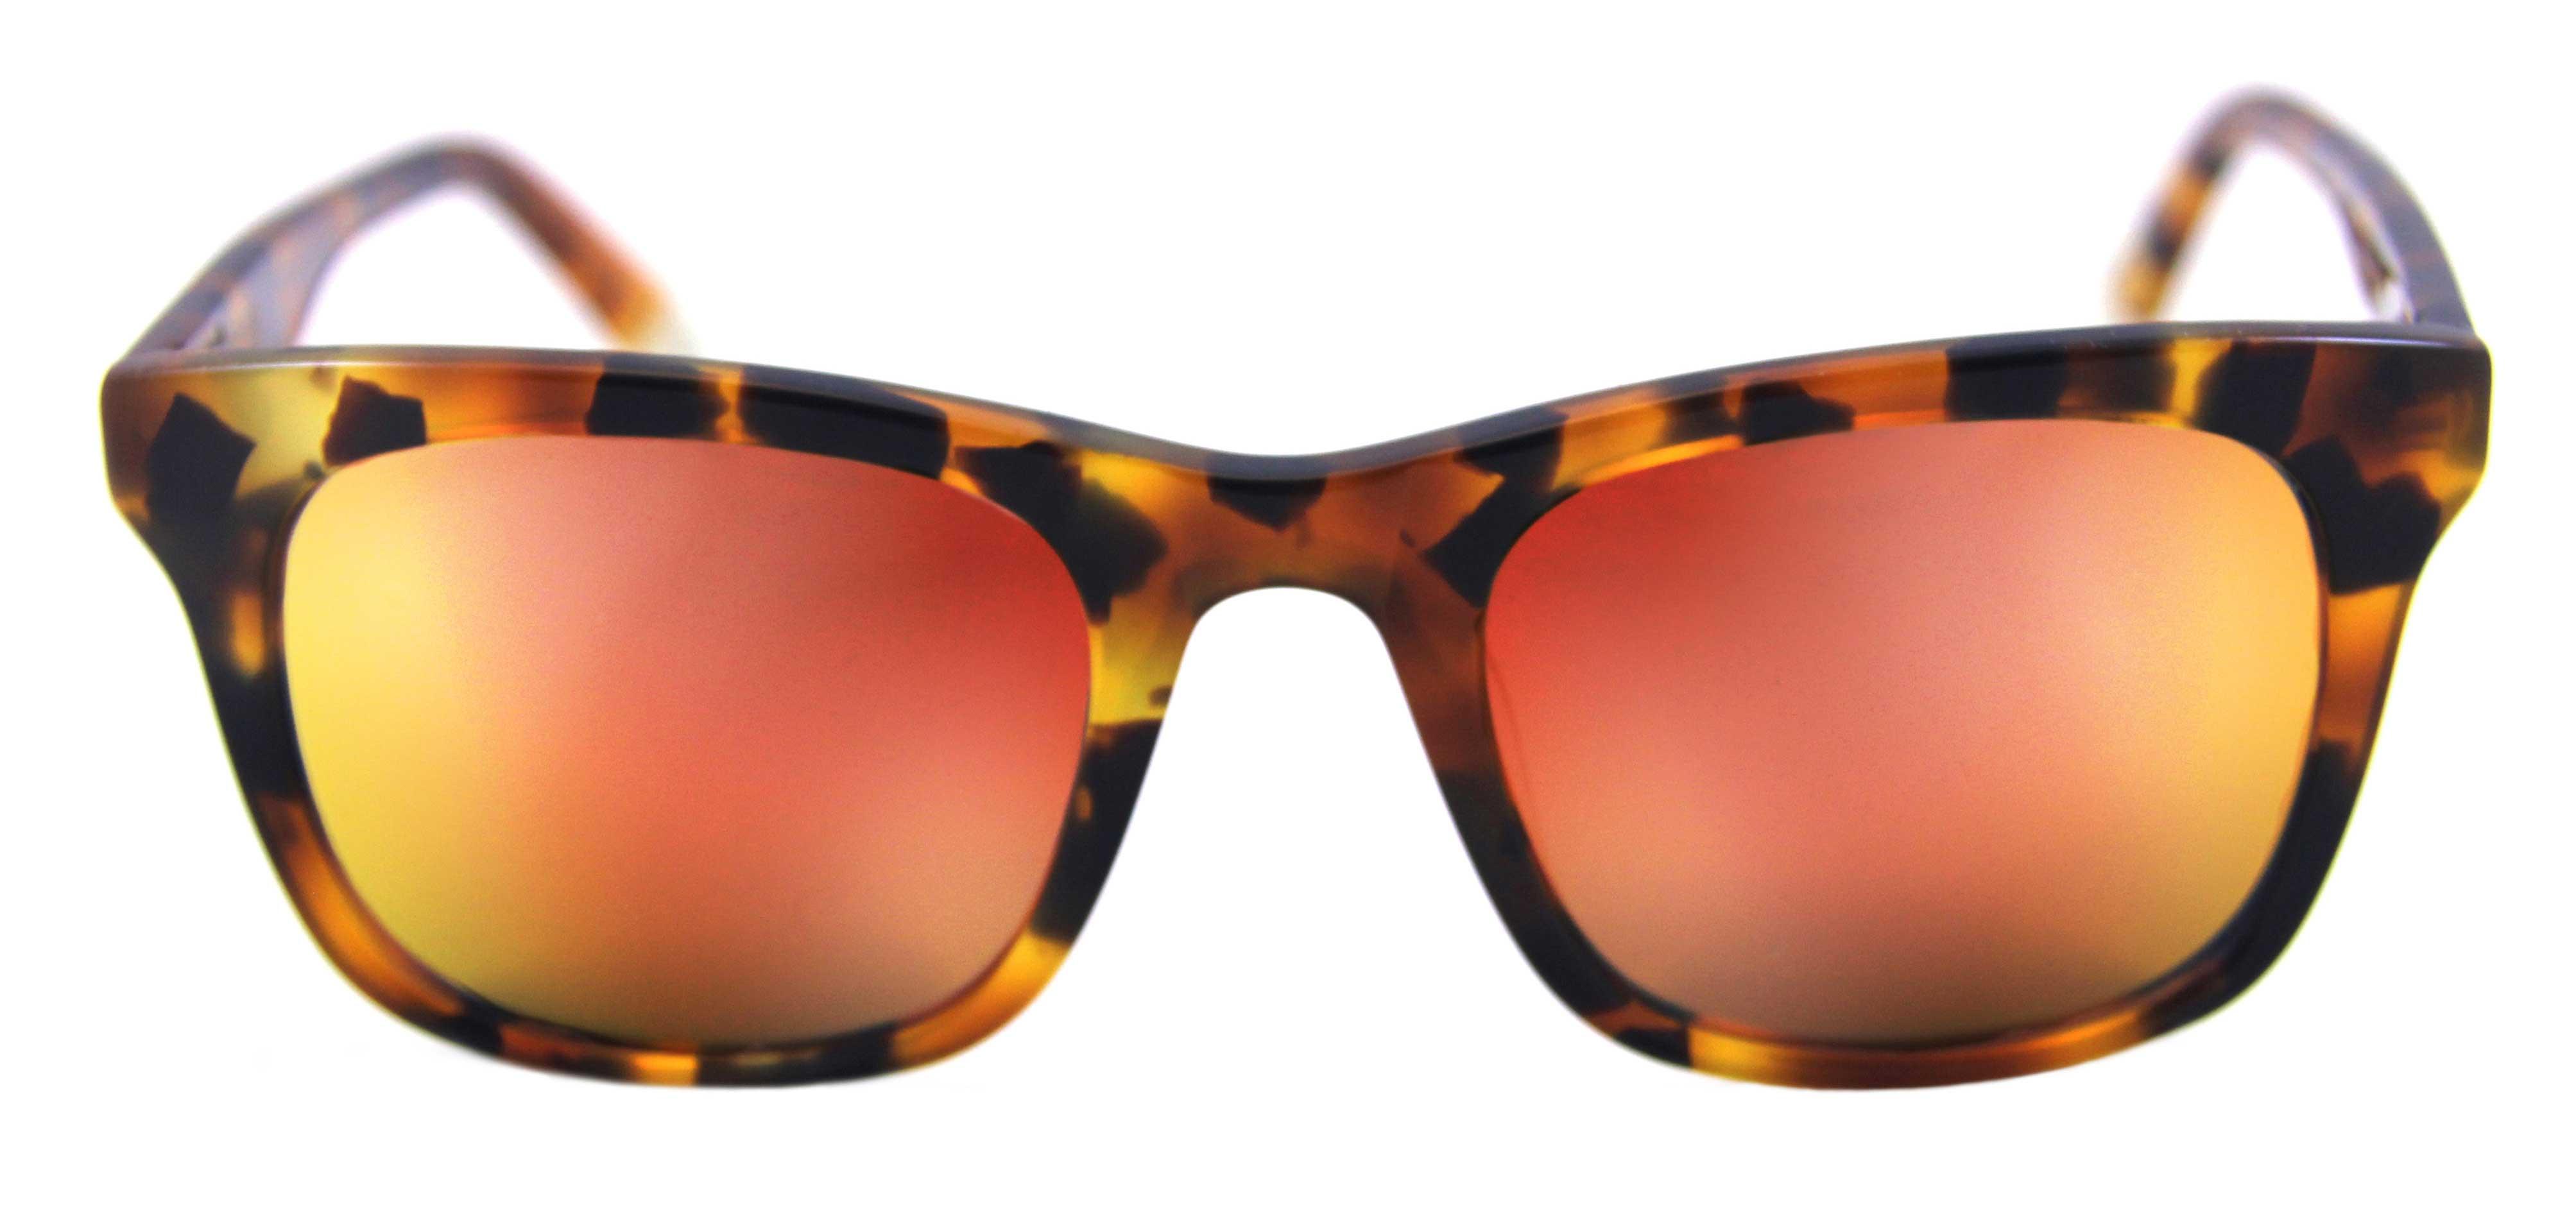 MADEAvery-Blonde-Tort-Fire-Orange_edit.jpg